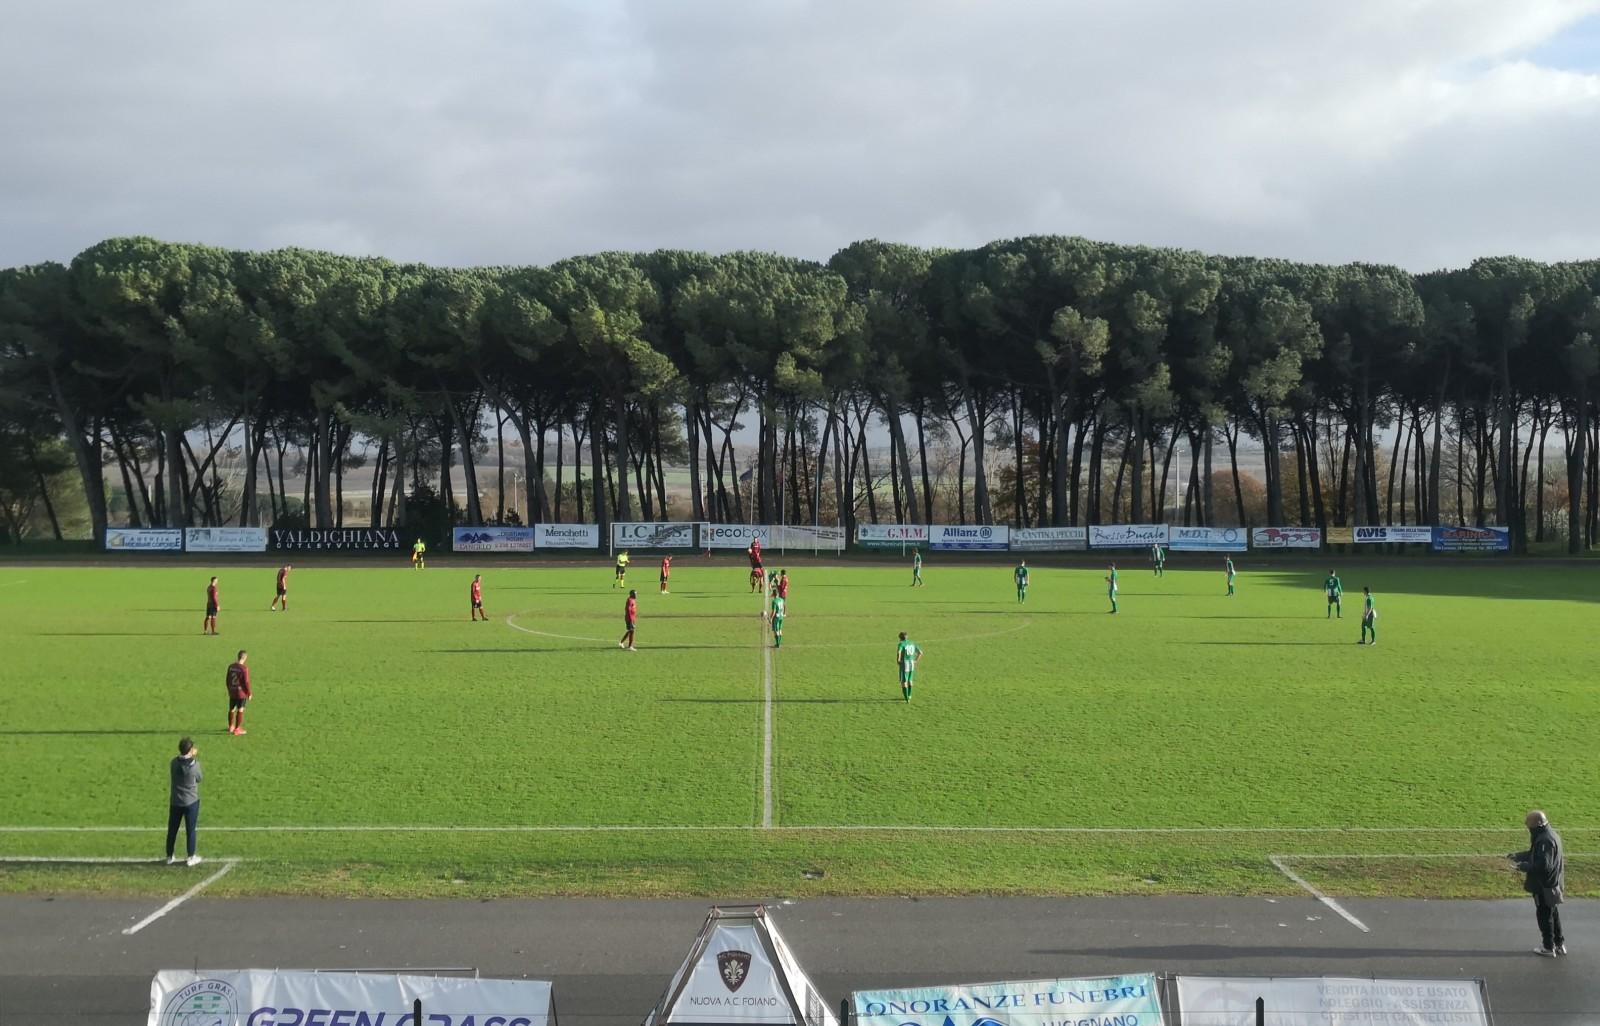 Foiano - Baldaccio 2-1 foto